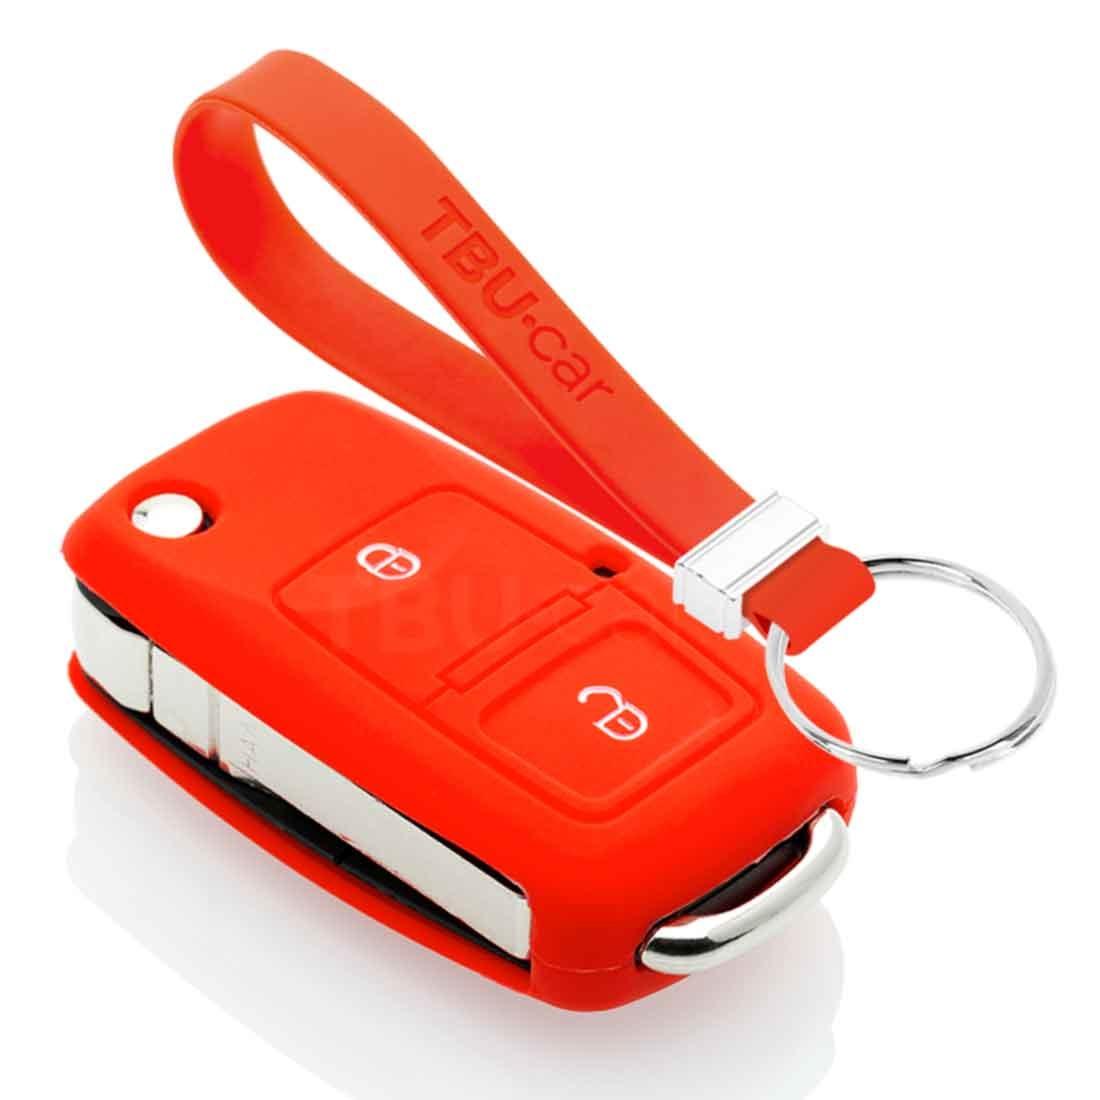 TBU car TBU car Autoschlüssel Hülle kompatibel mit Audi 2 Tasten - Schutzhülle aus Silikon - Auto Schlüsselhülle Cover in Rot